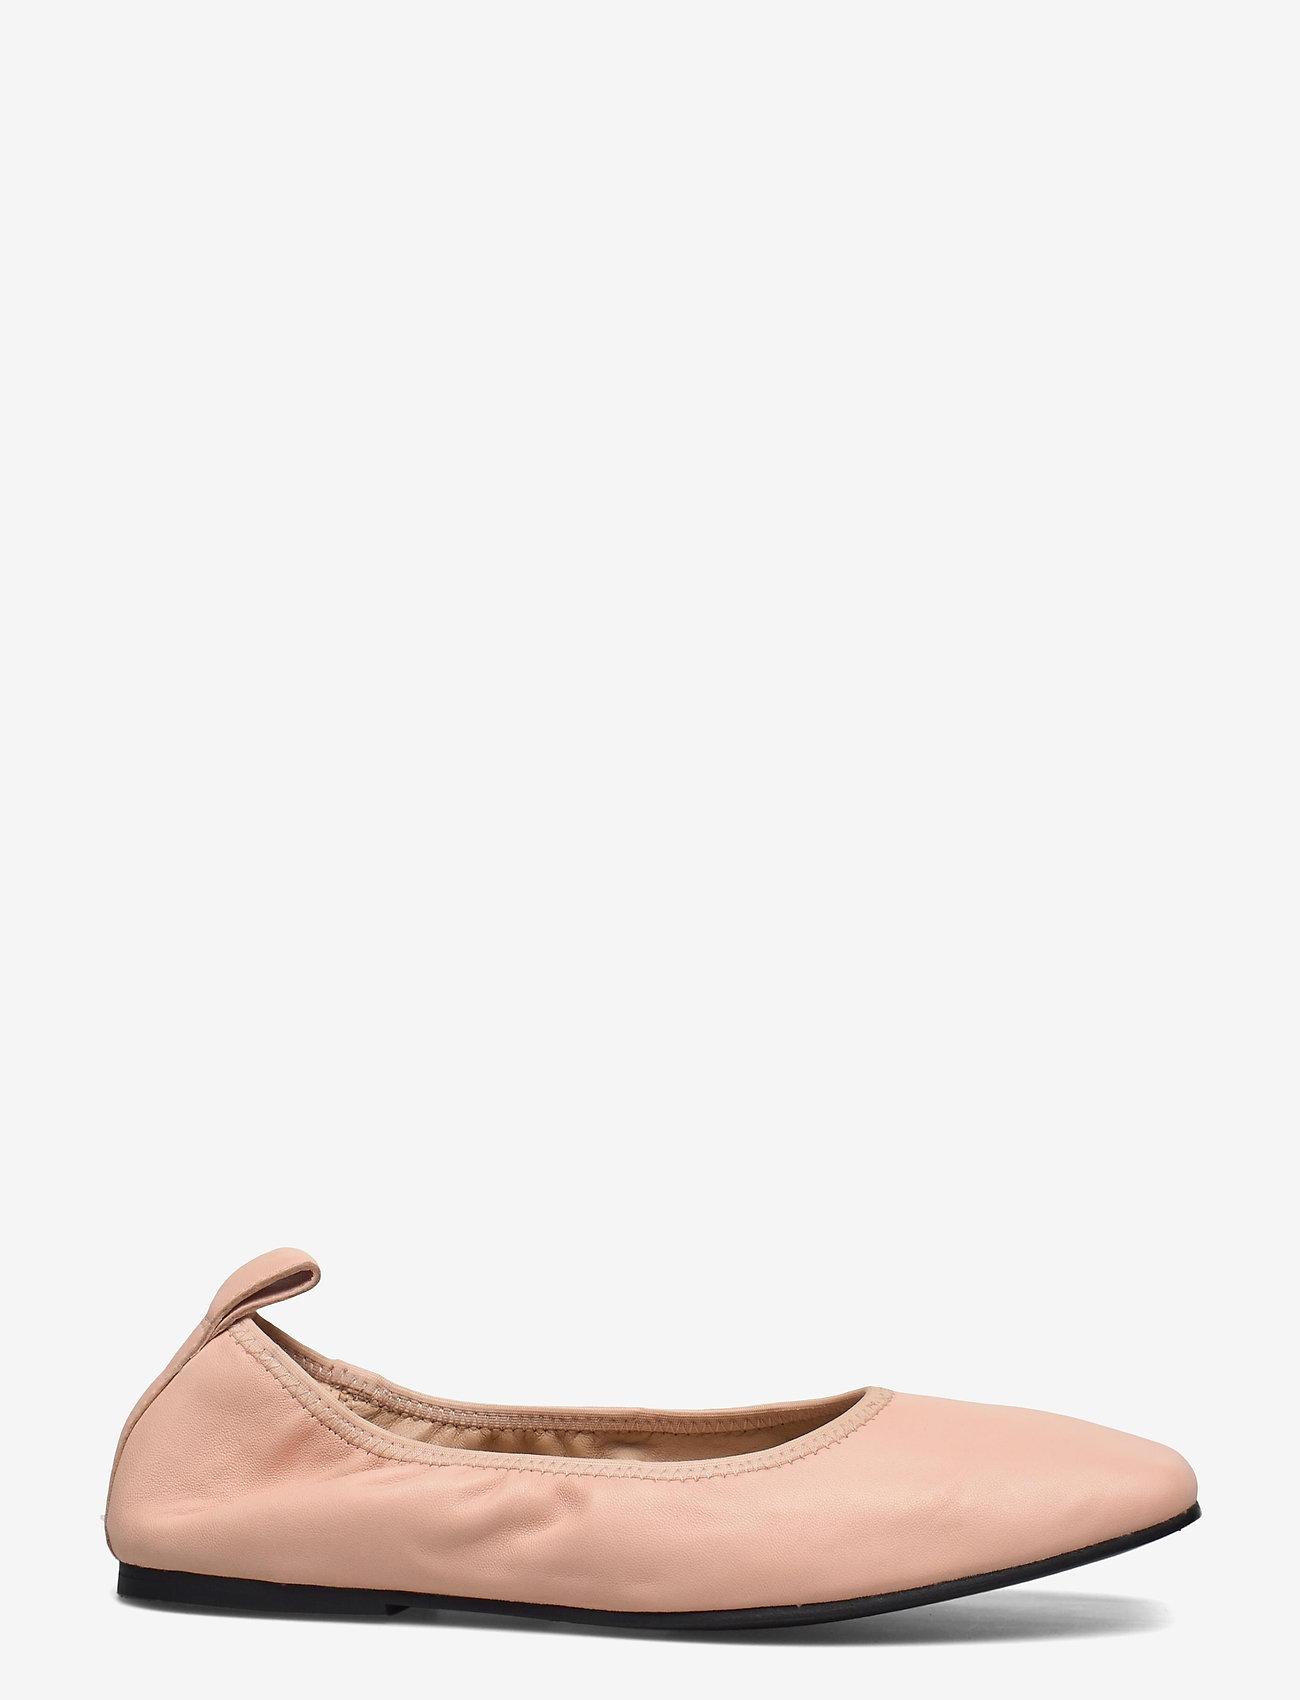 Clarks - Pure Ballet - ballerinas - light pink lea - 1